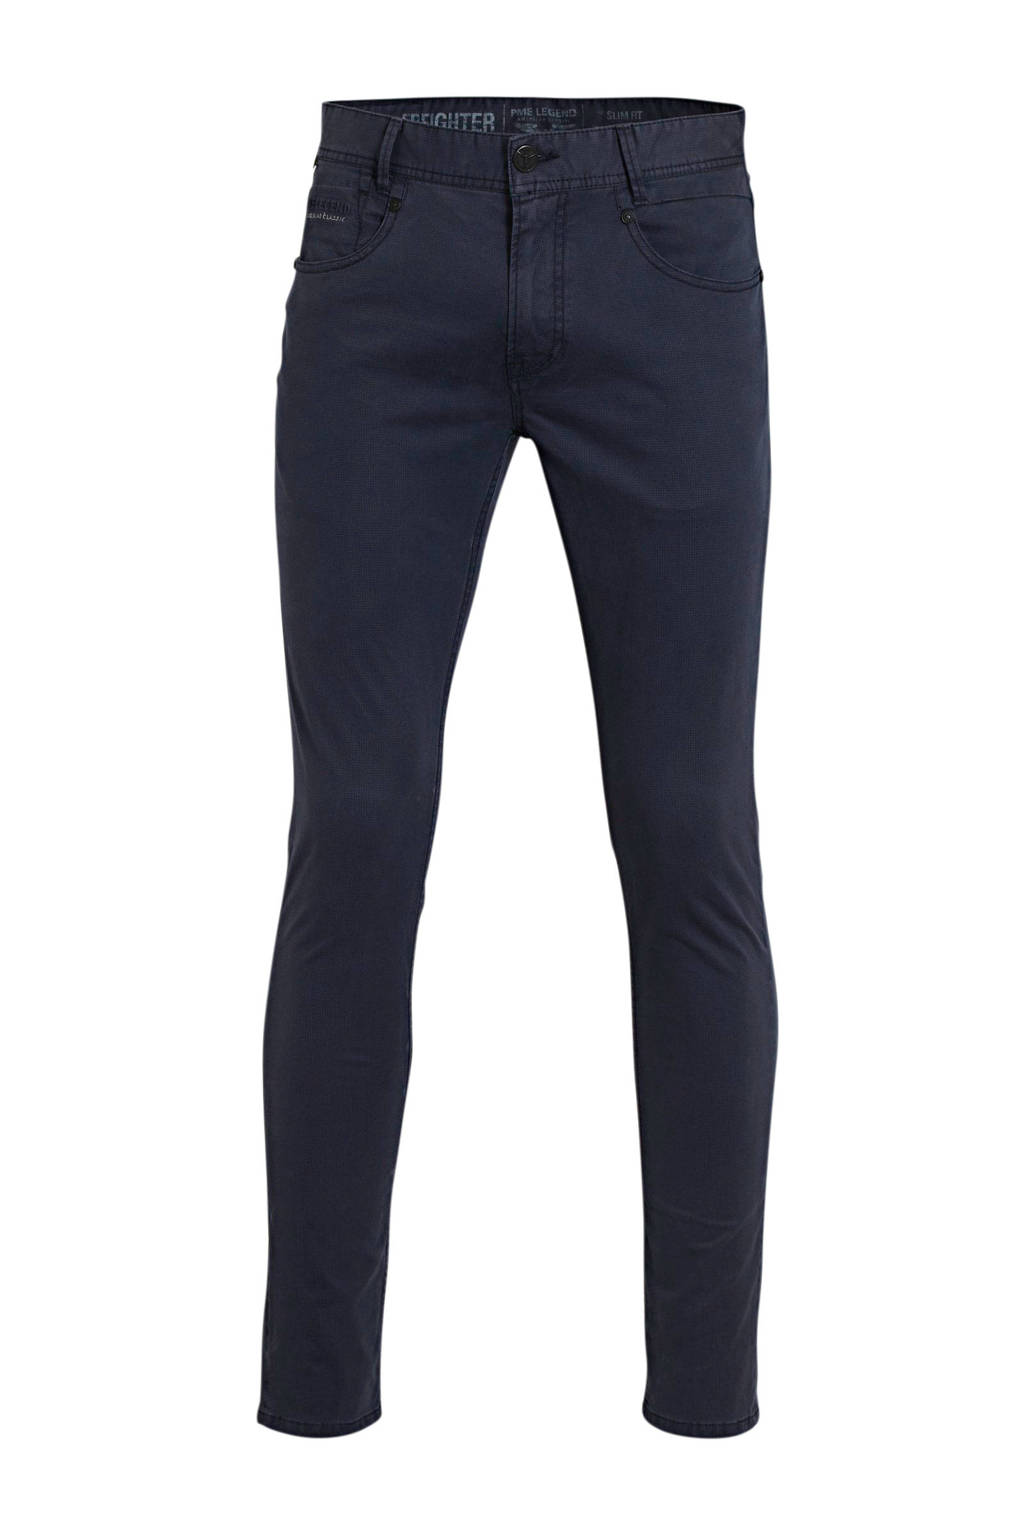 PME Legend slim fit broek donkerblauw, Donkerblauw